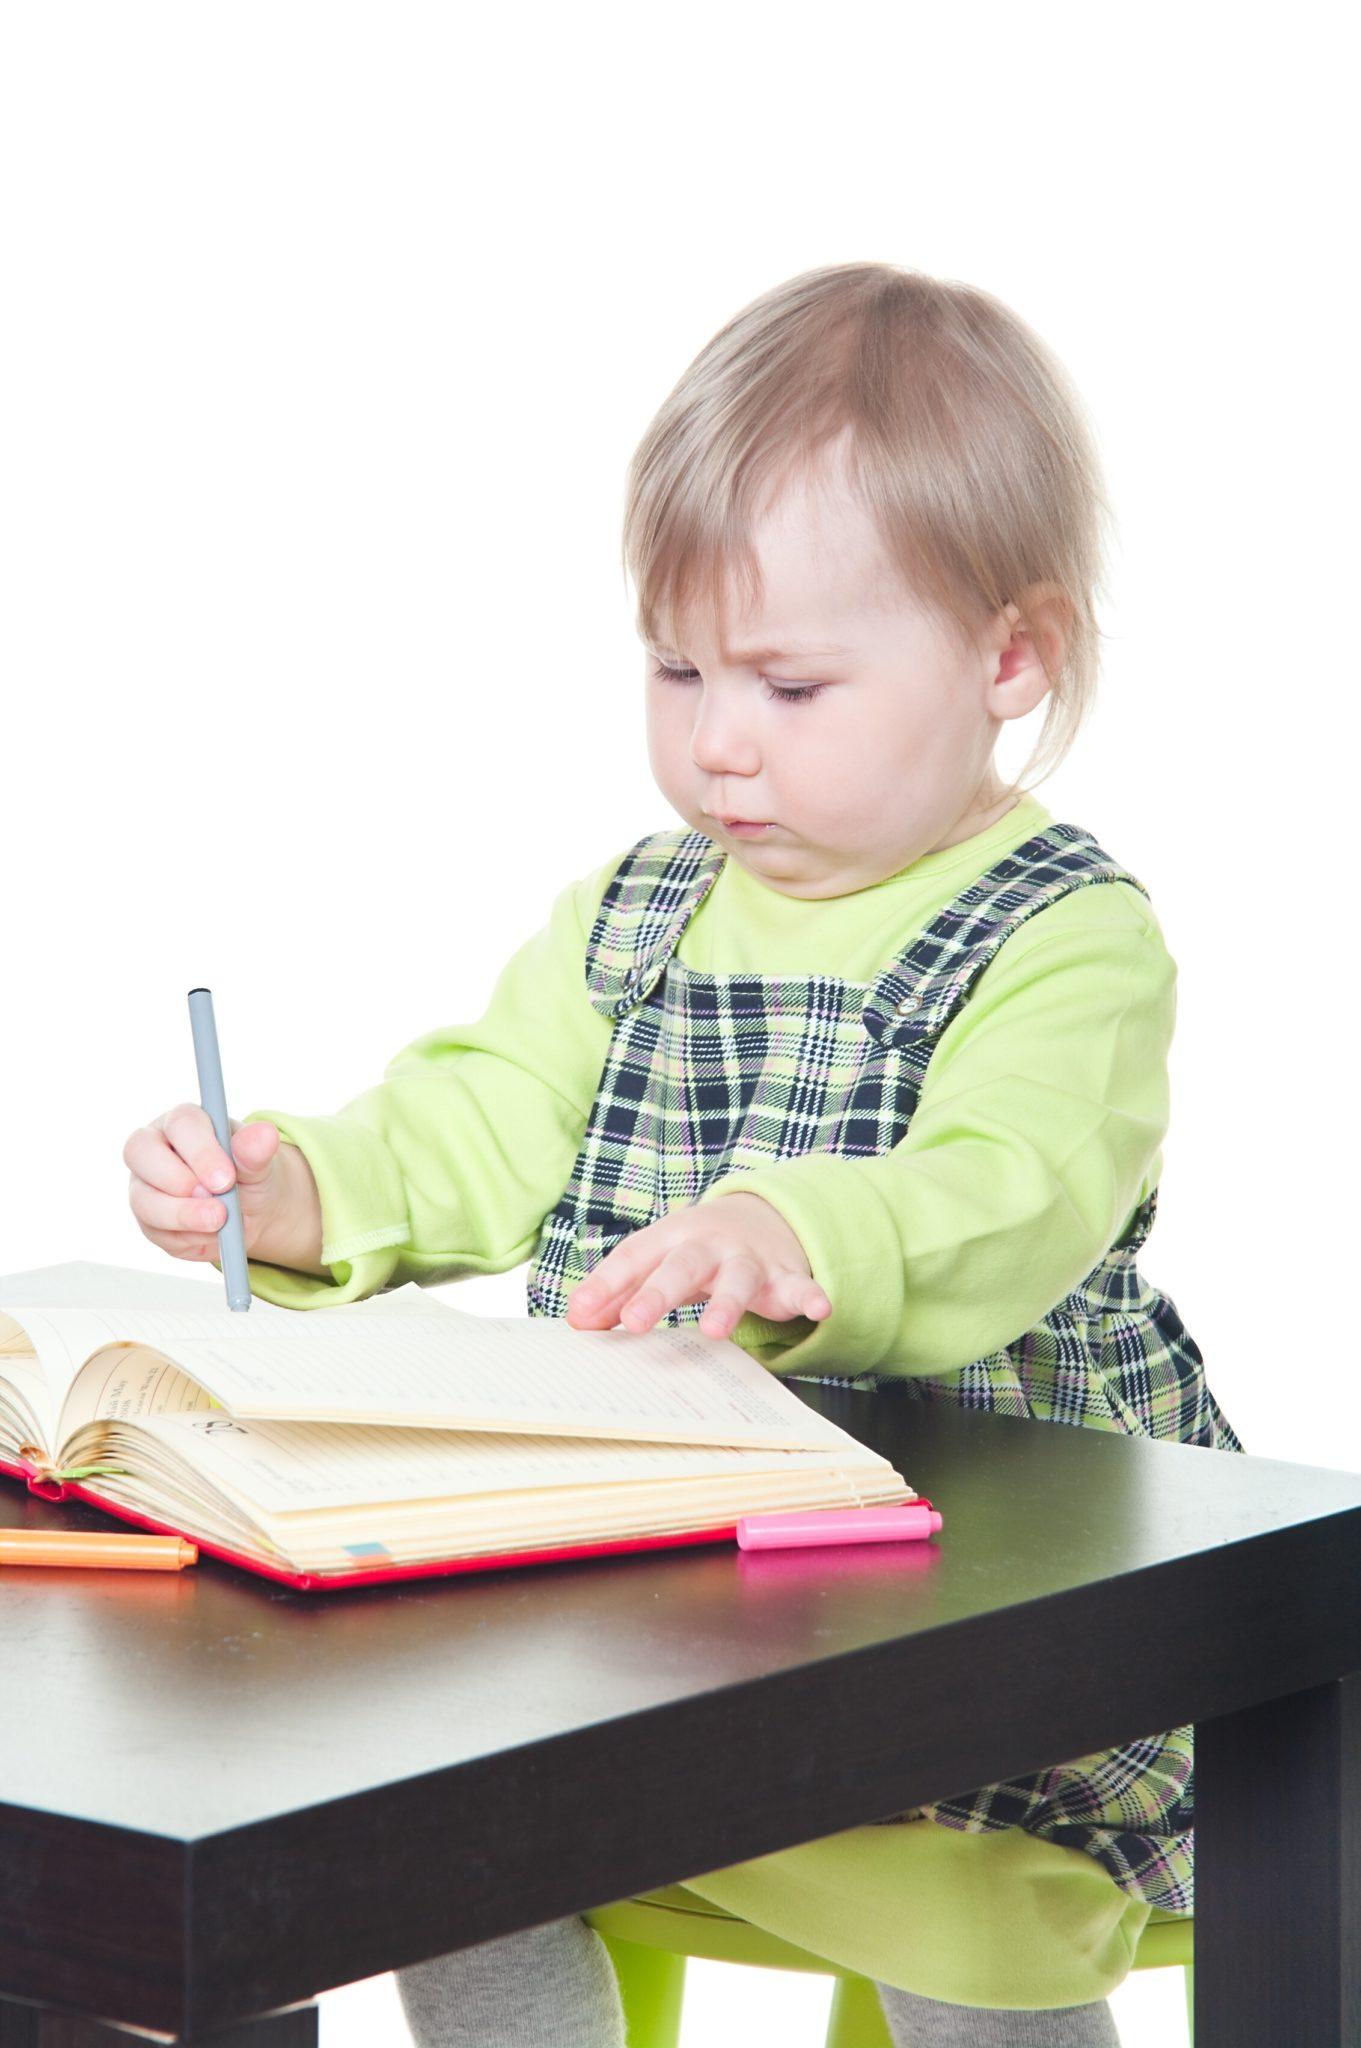 Girl drawing in book.